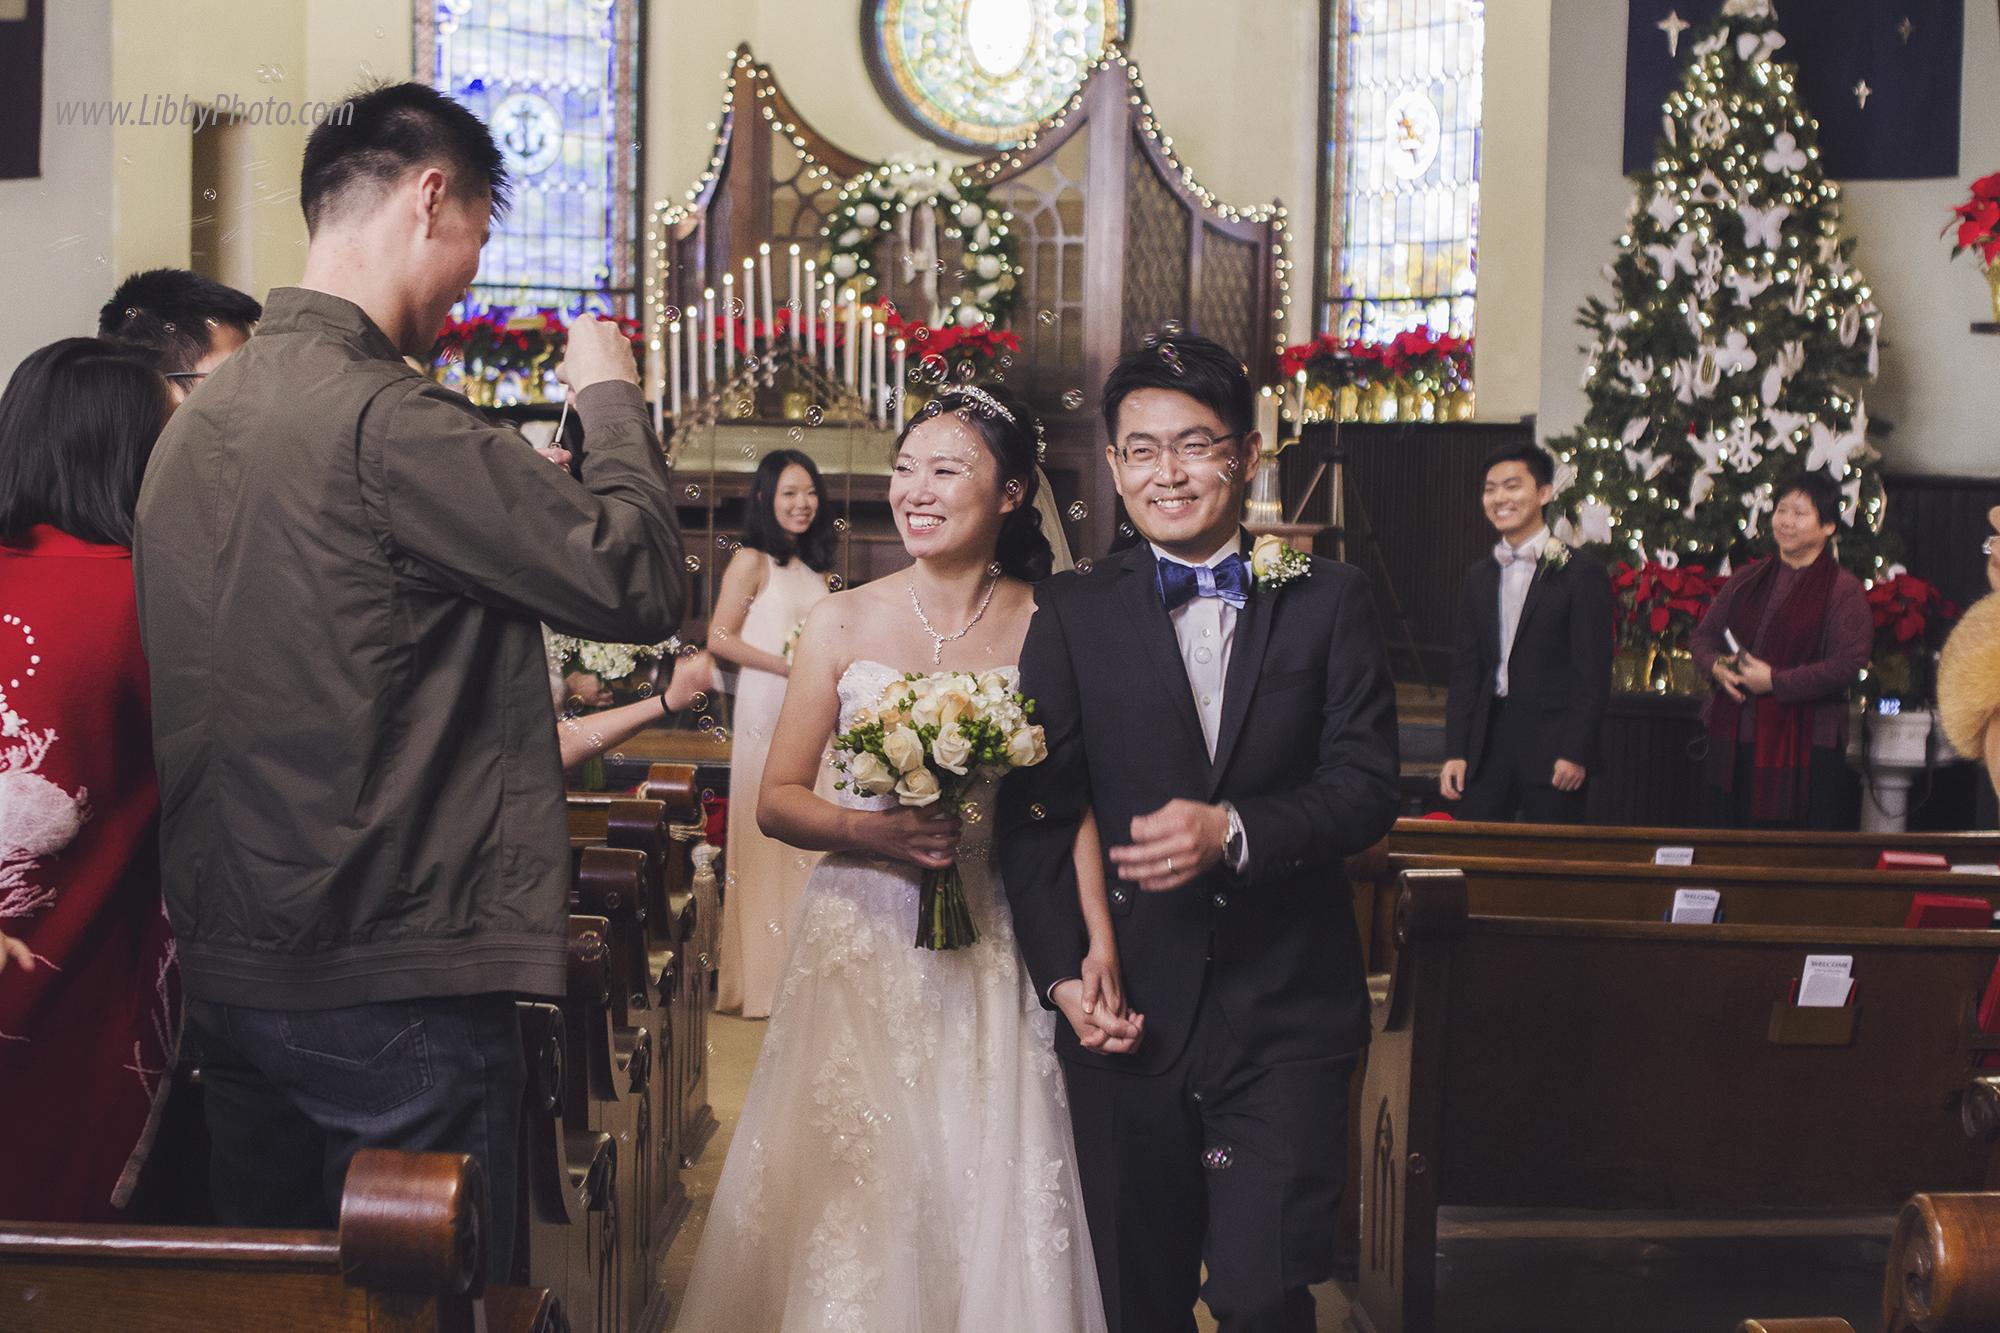 Atlanta wedding photography Libbyphoto (25).jpg